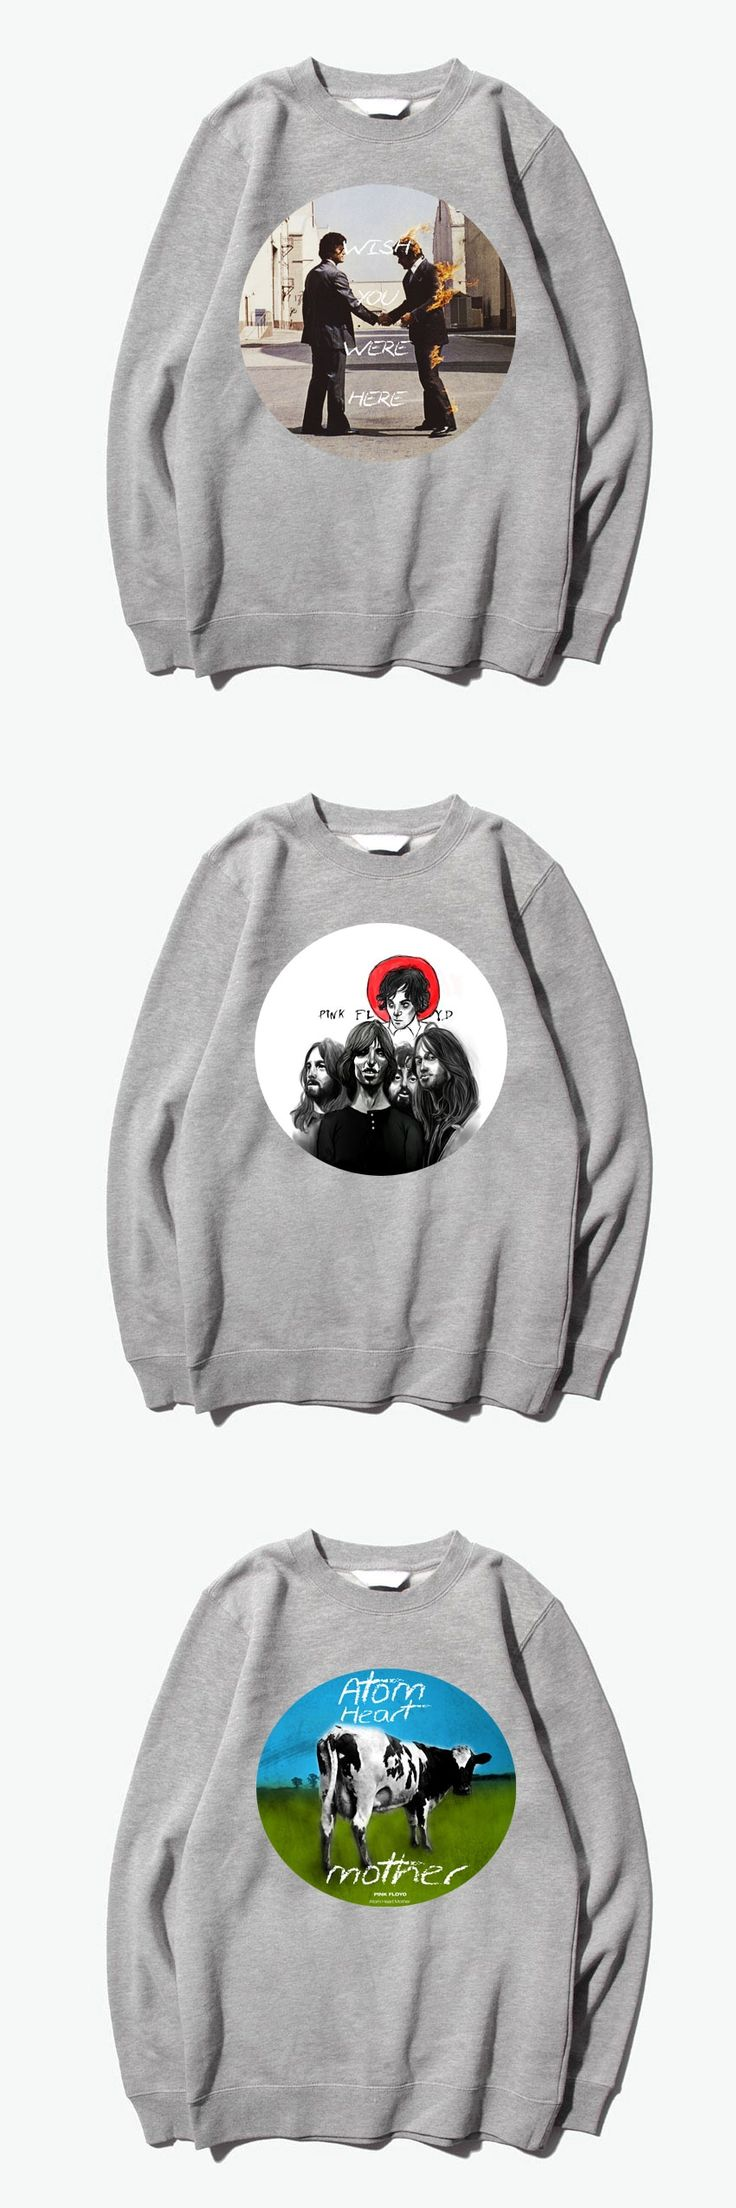 Pink Floyd atom heart mother fashion Hoodies Sweatshirts